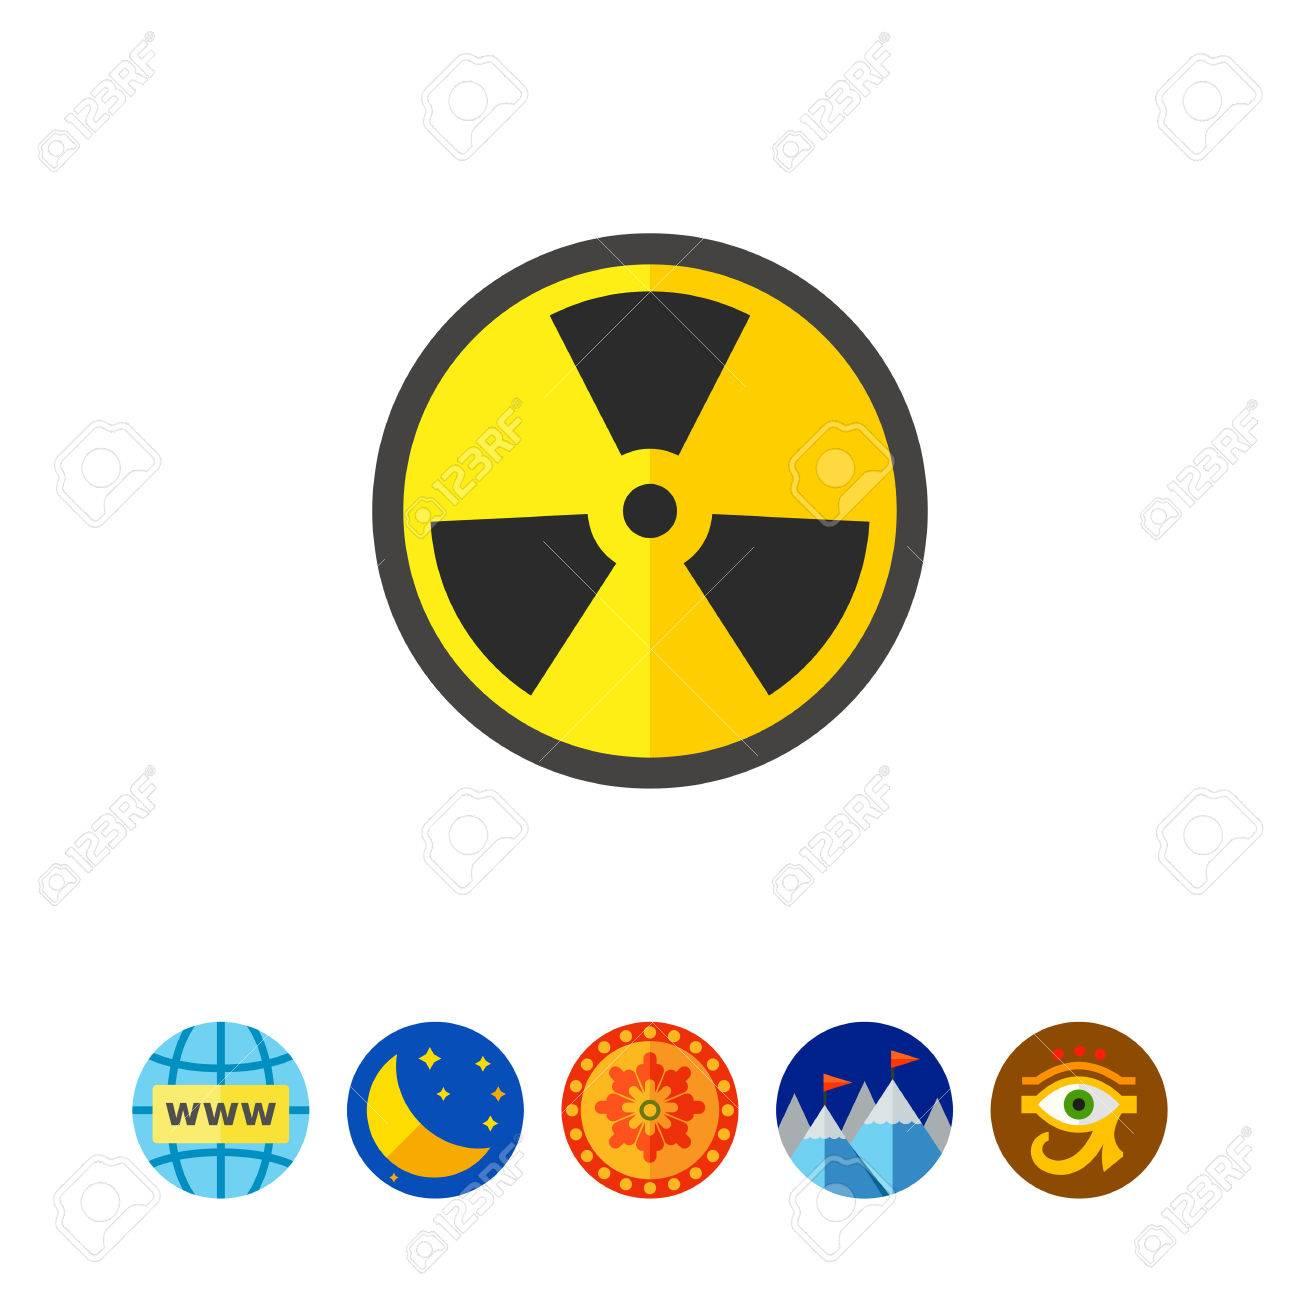 Black And Yellow International Radiation Hazard Symbol Physics